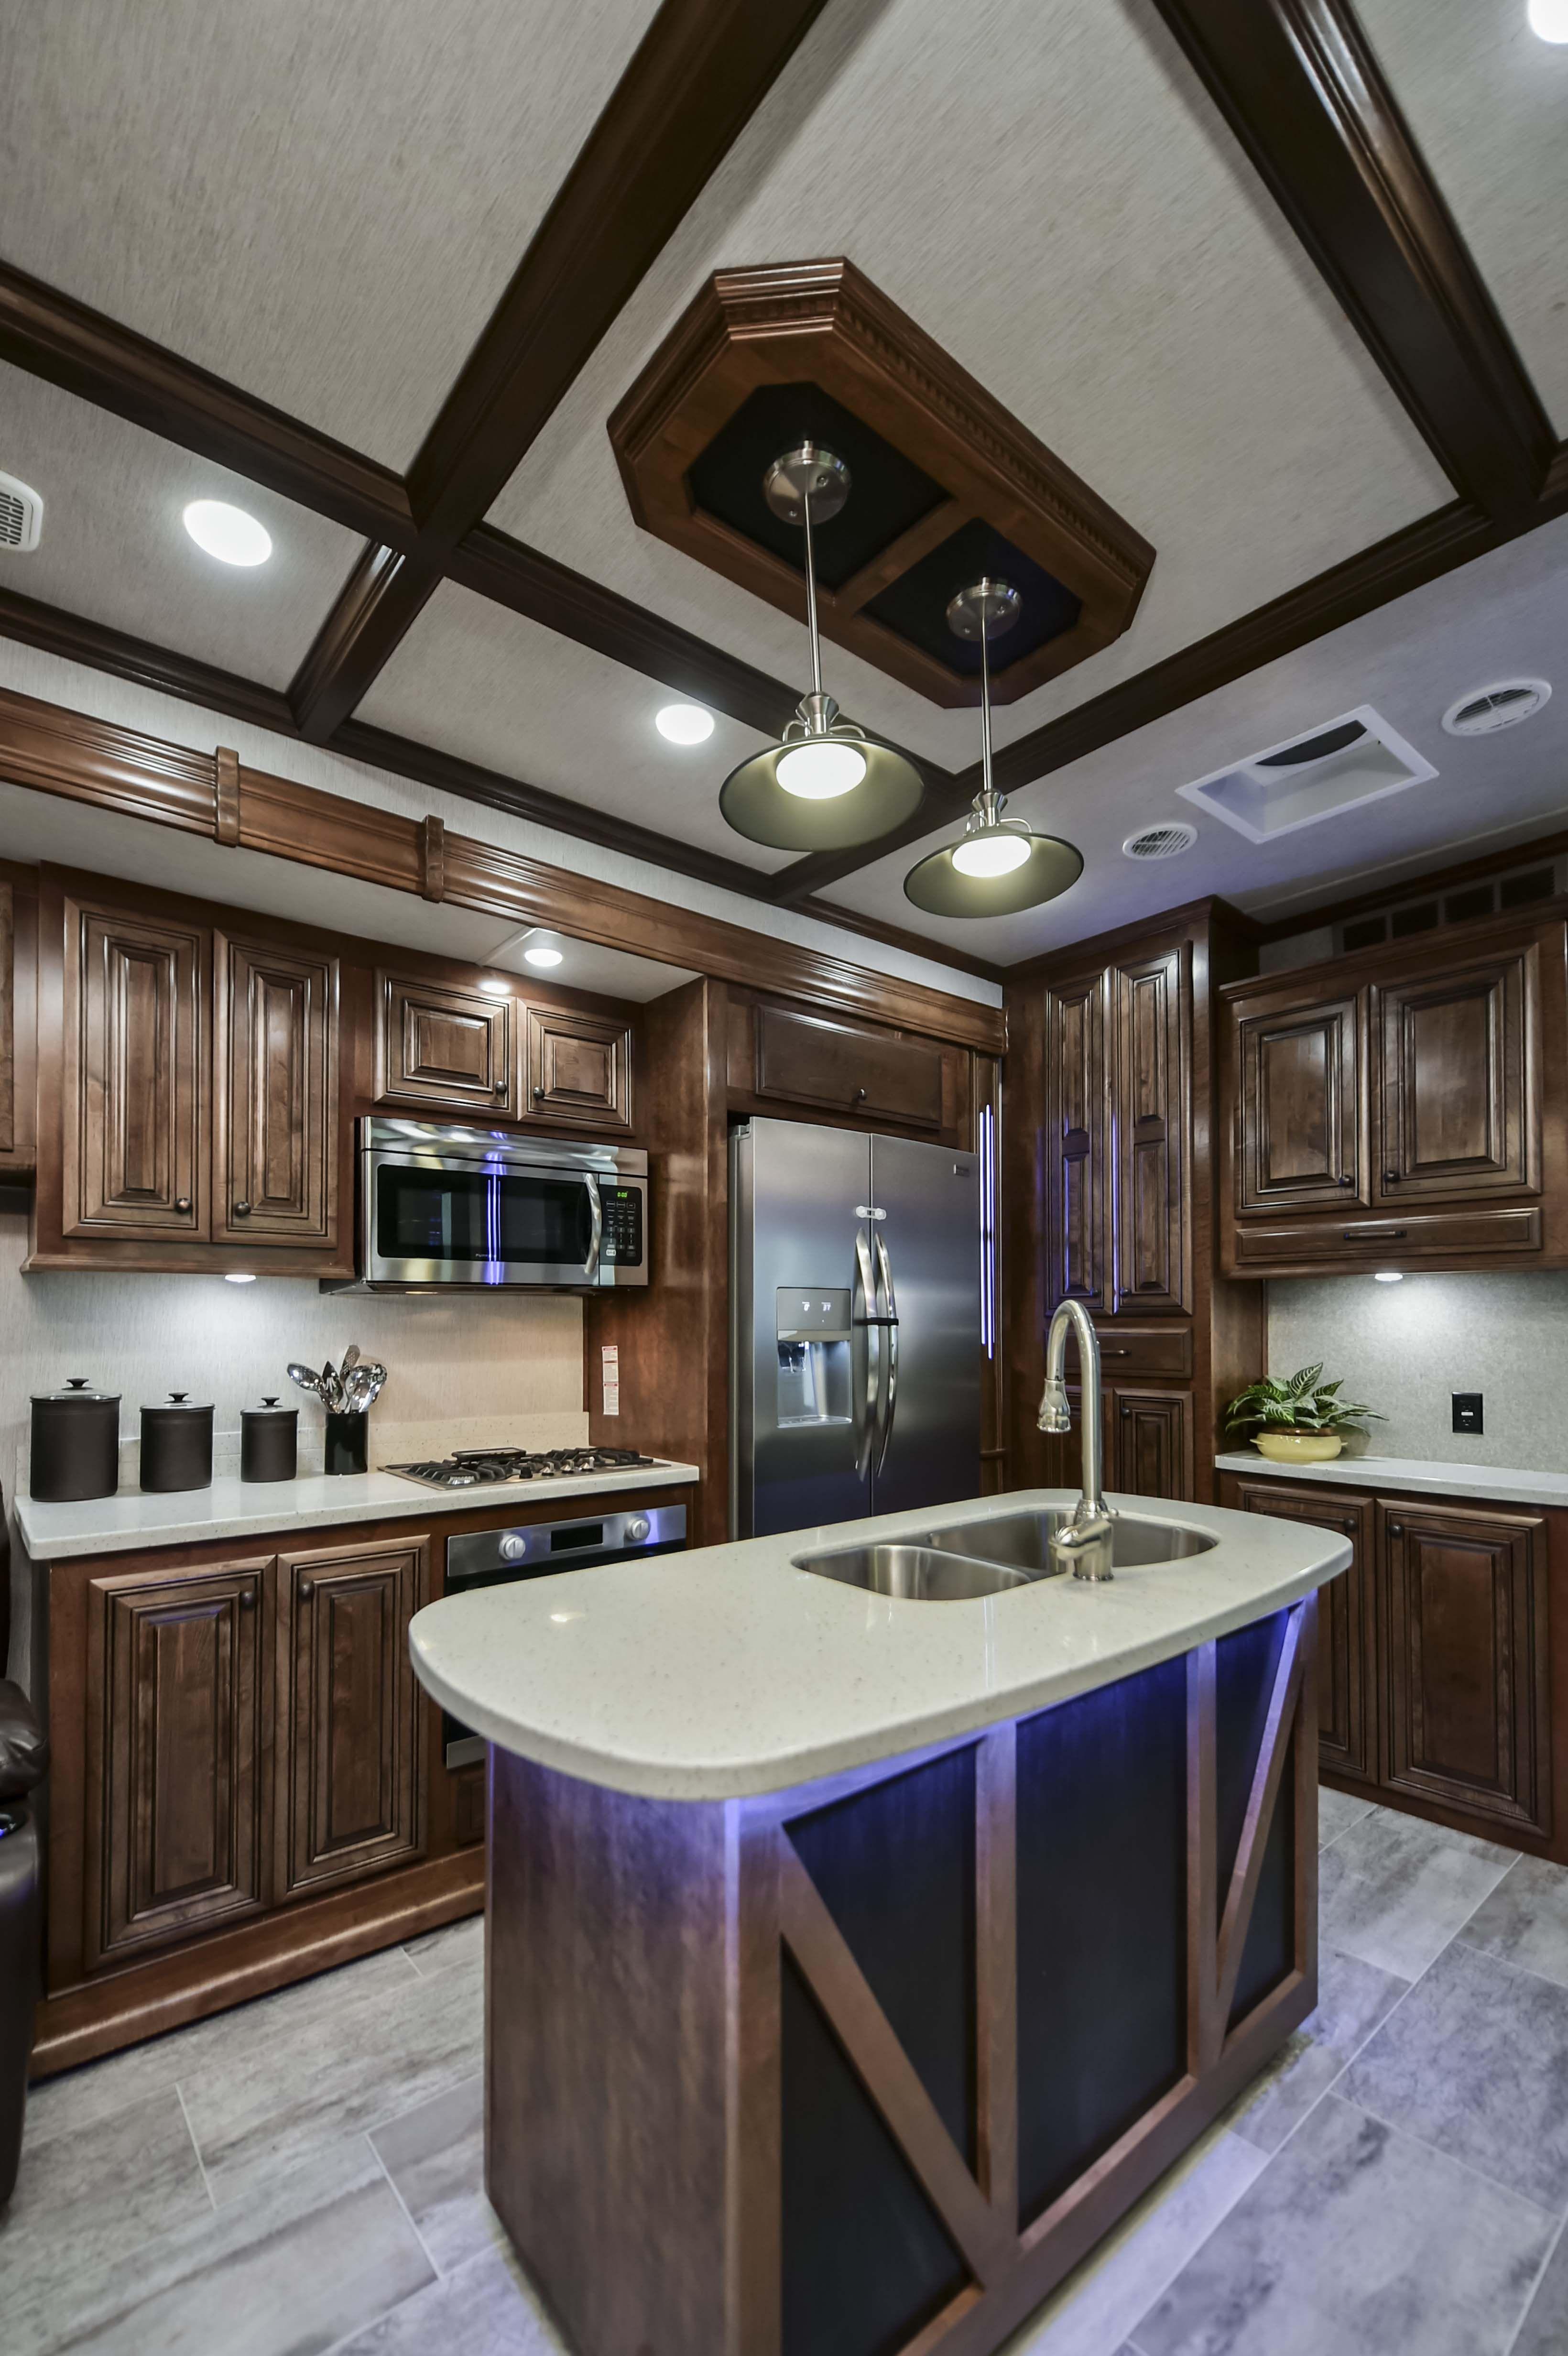 Kitchen In The 2018 Bighorn 3500se Luxury 5th Wheel Heartlandrvs